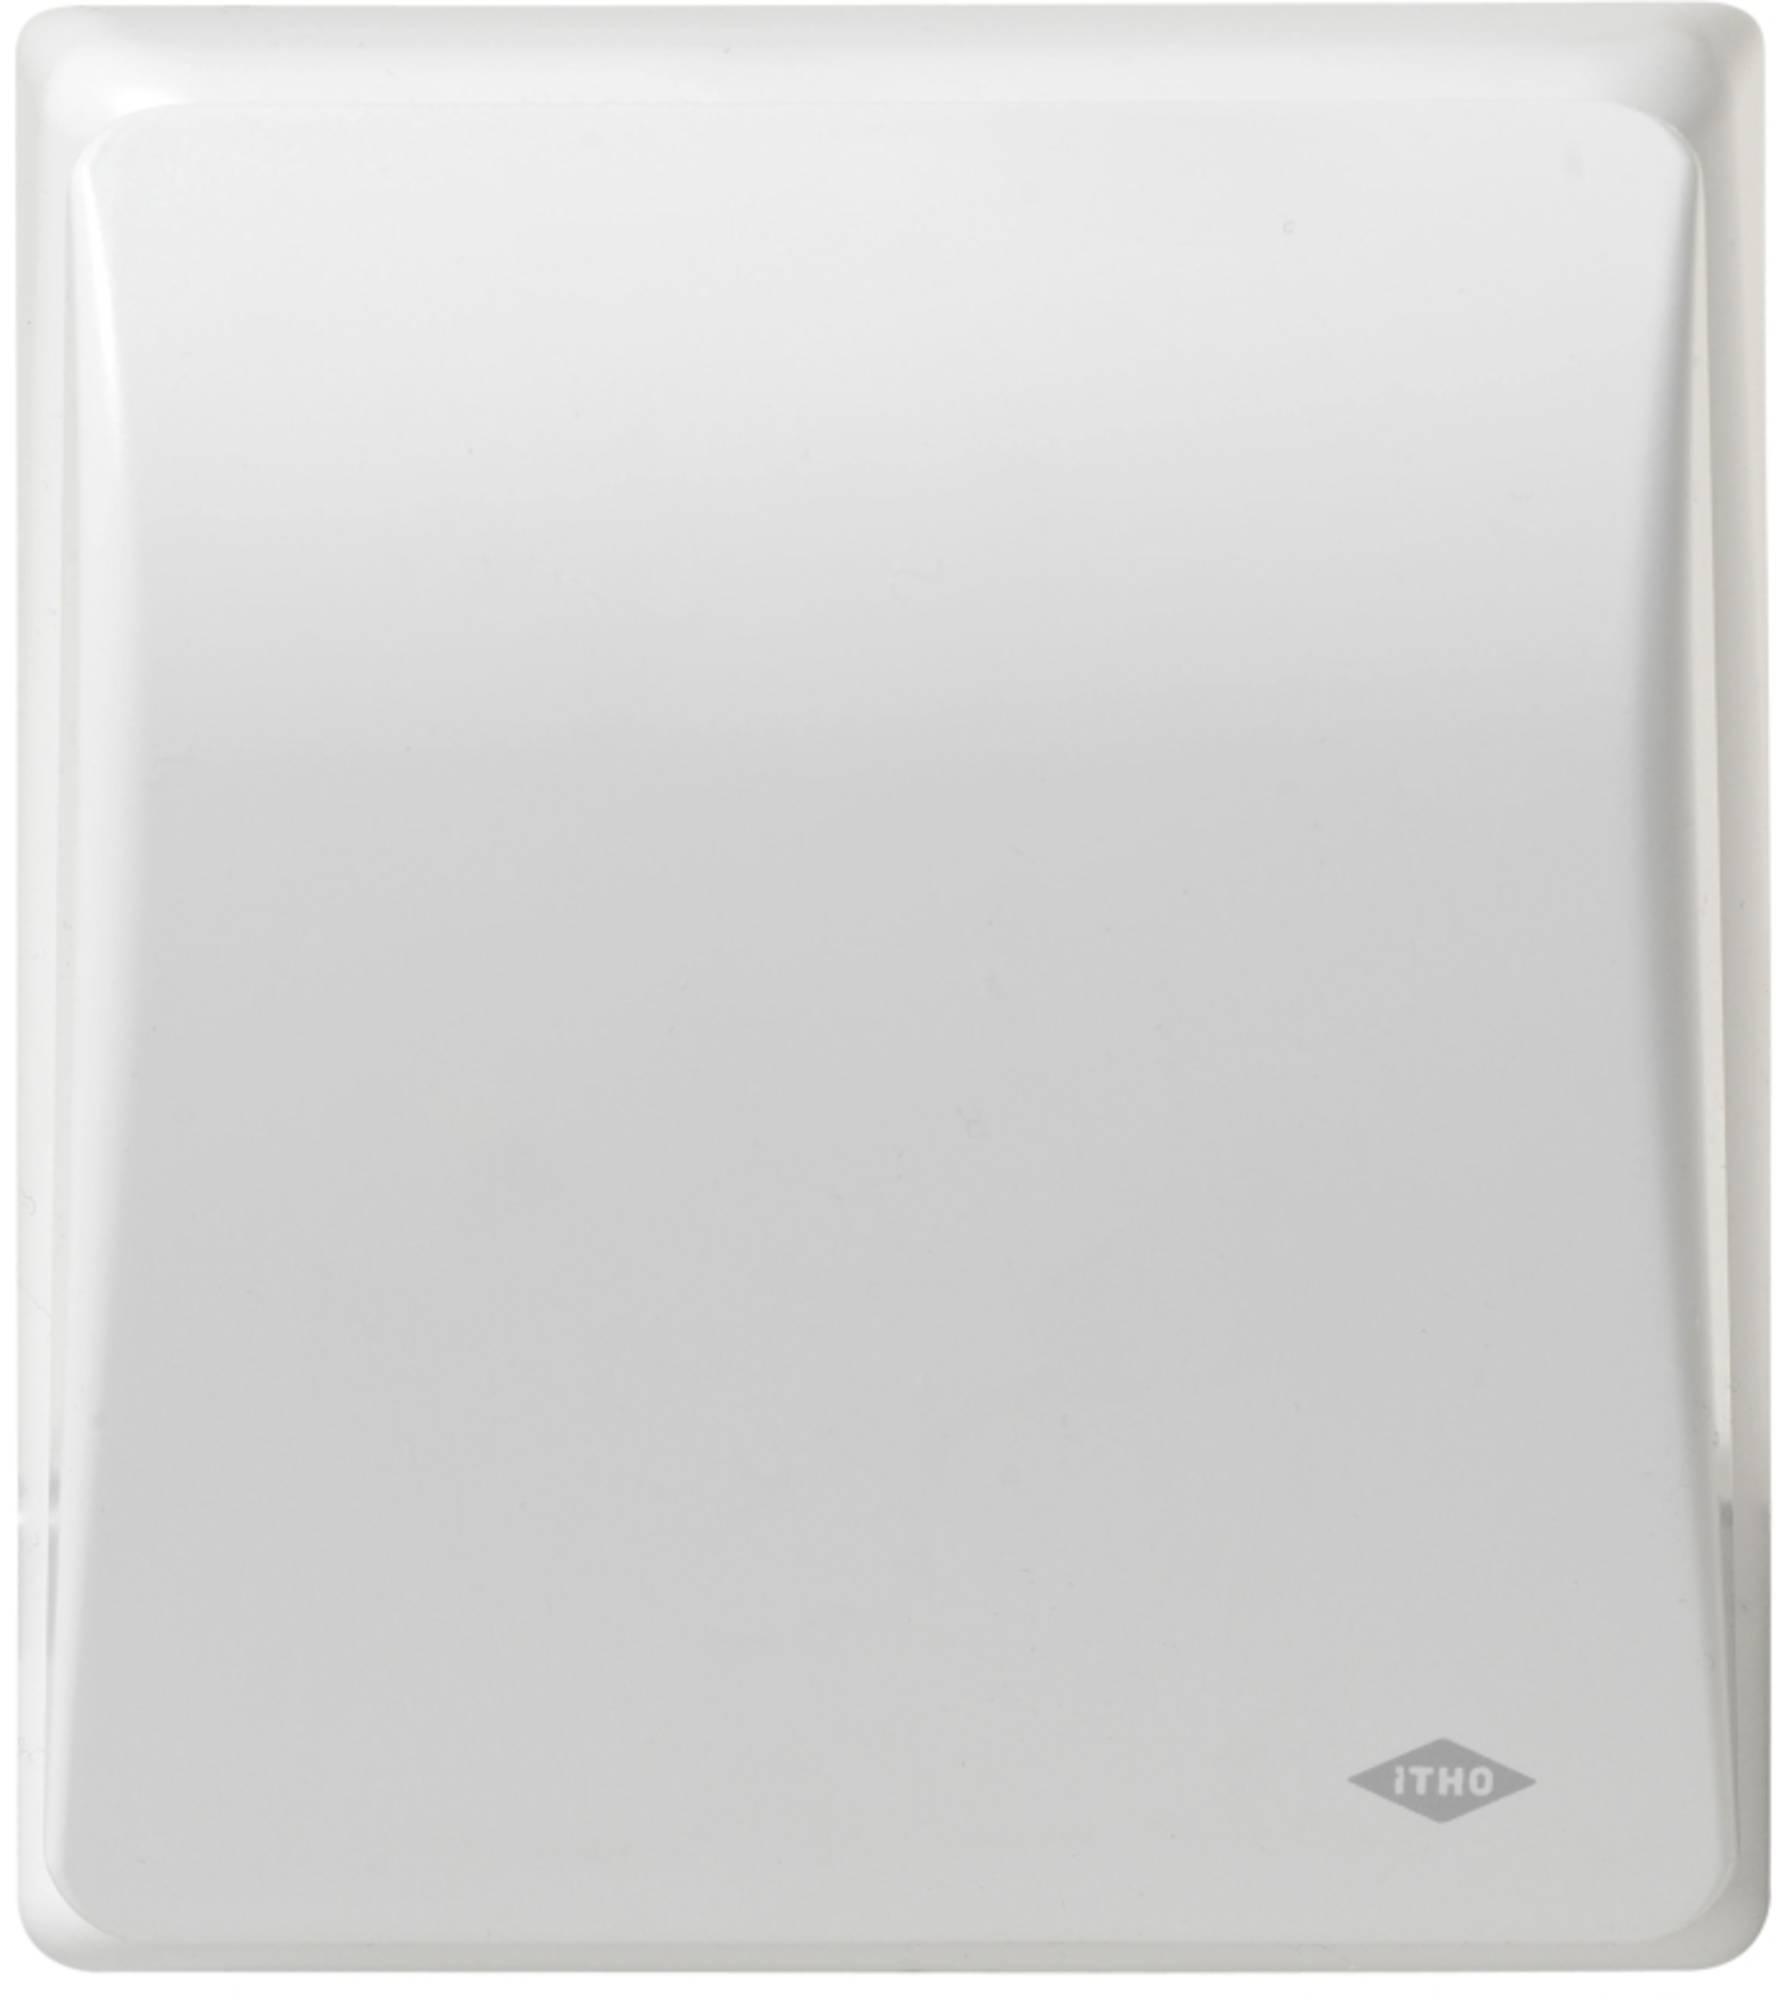 ITHO kanaalventilator 230v met timer en hygrostaat WIT (5400931N)